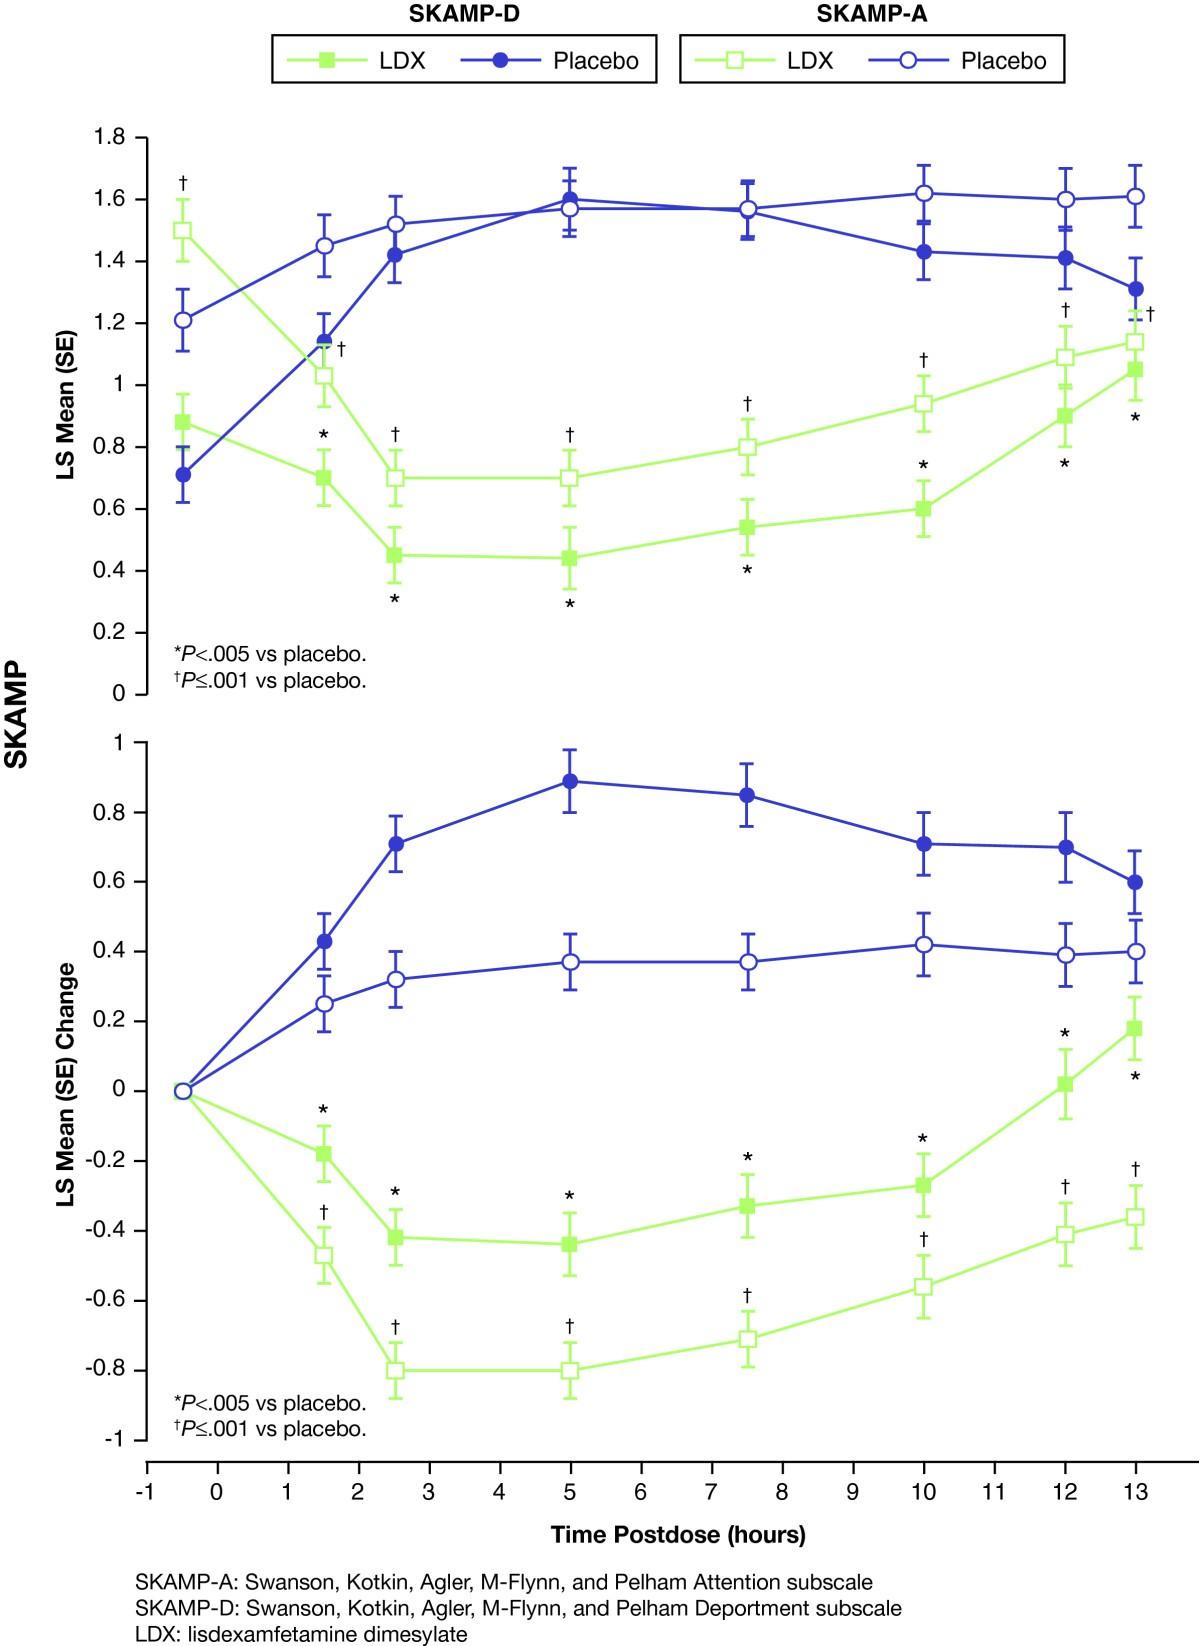 A 13 Hour Laboratory School Study Of Lisdexamfetamine Dimesylate In